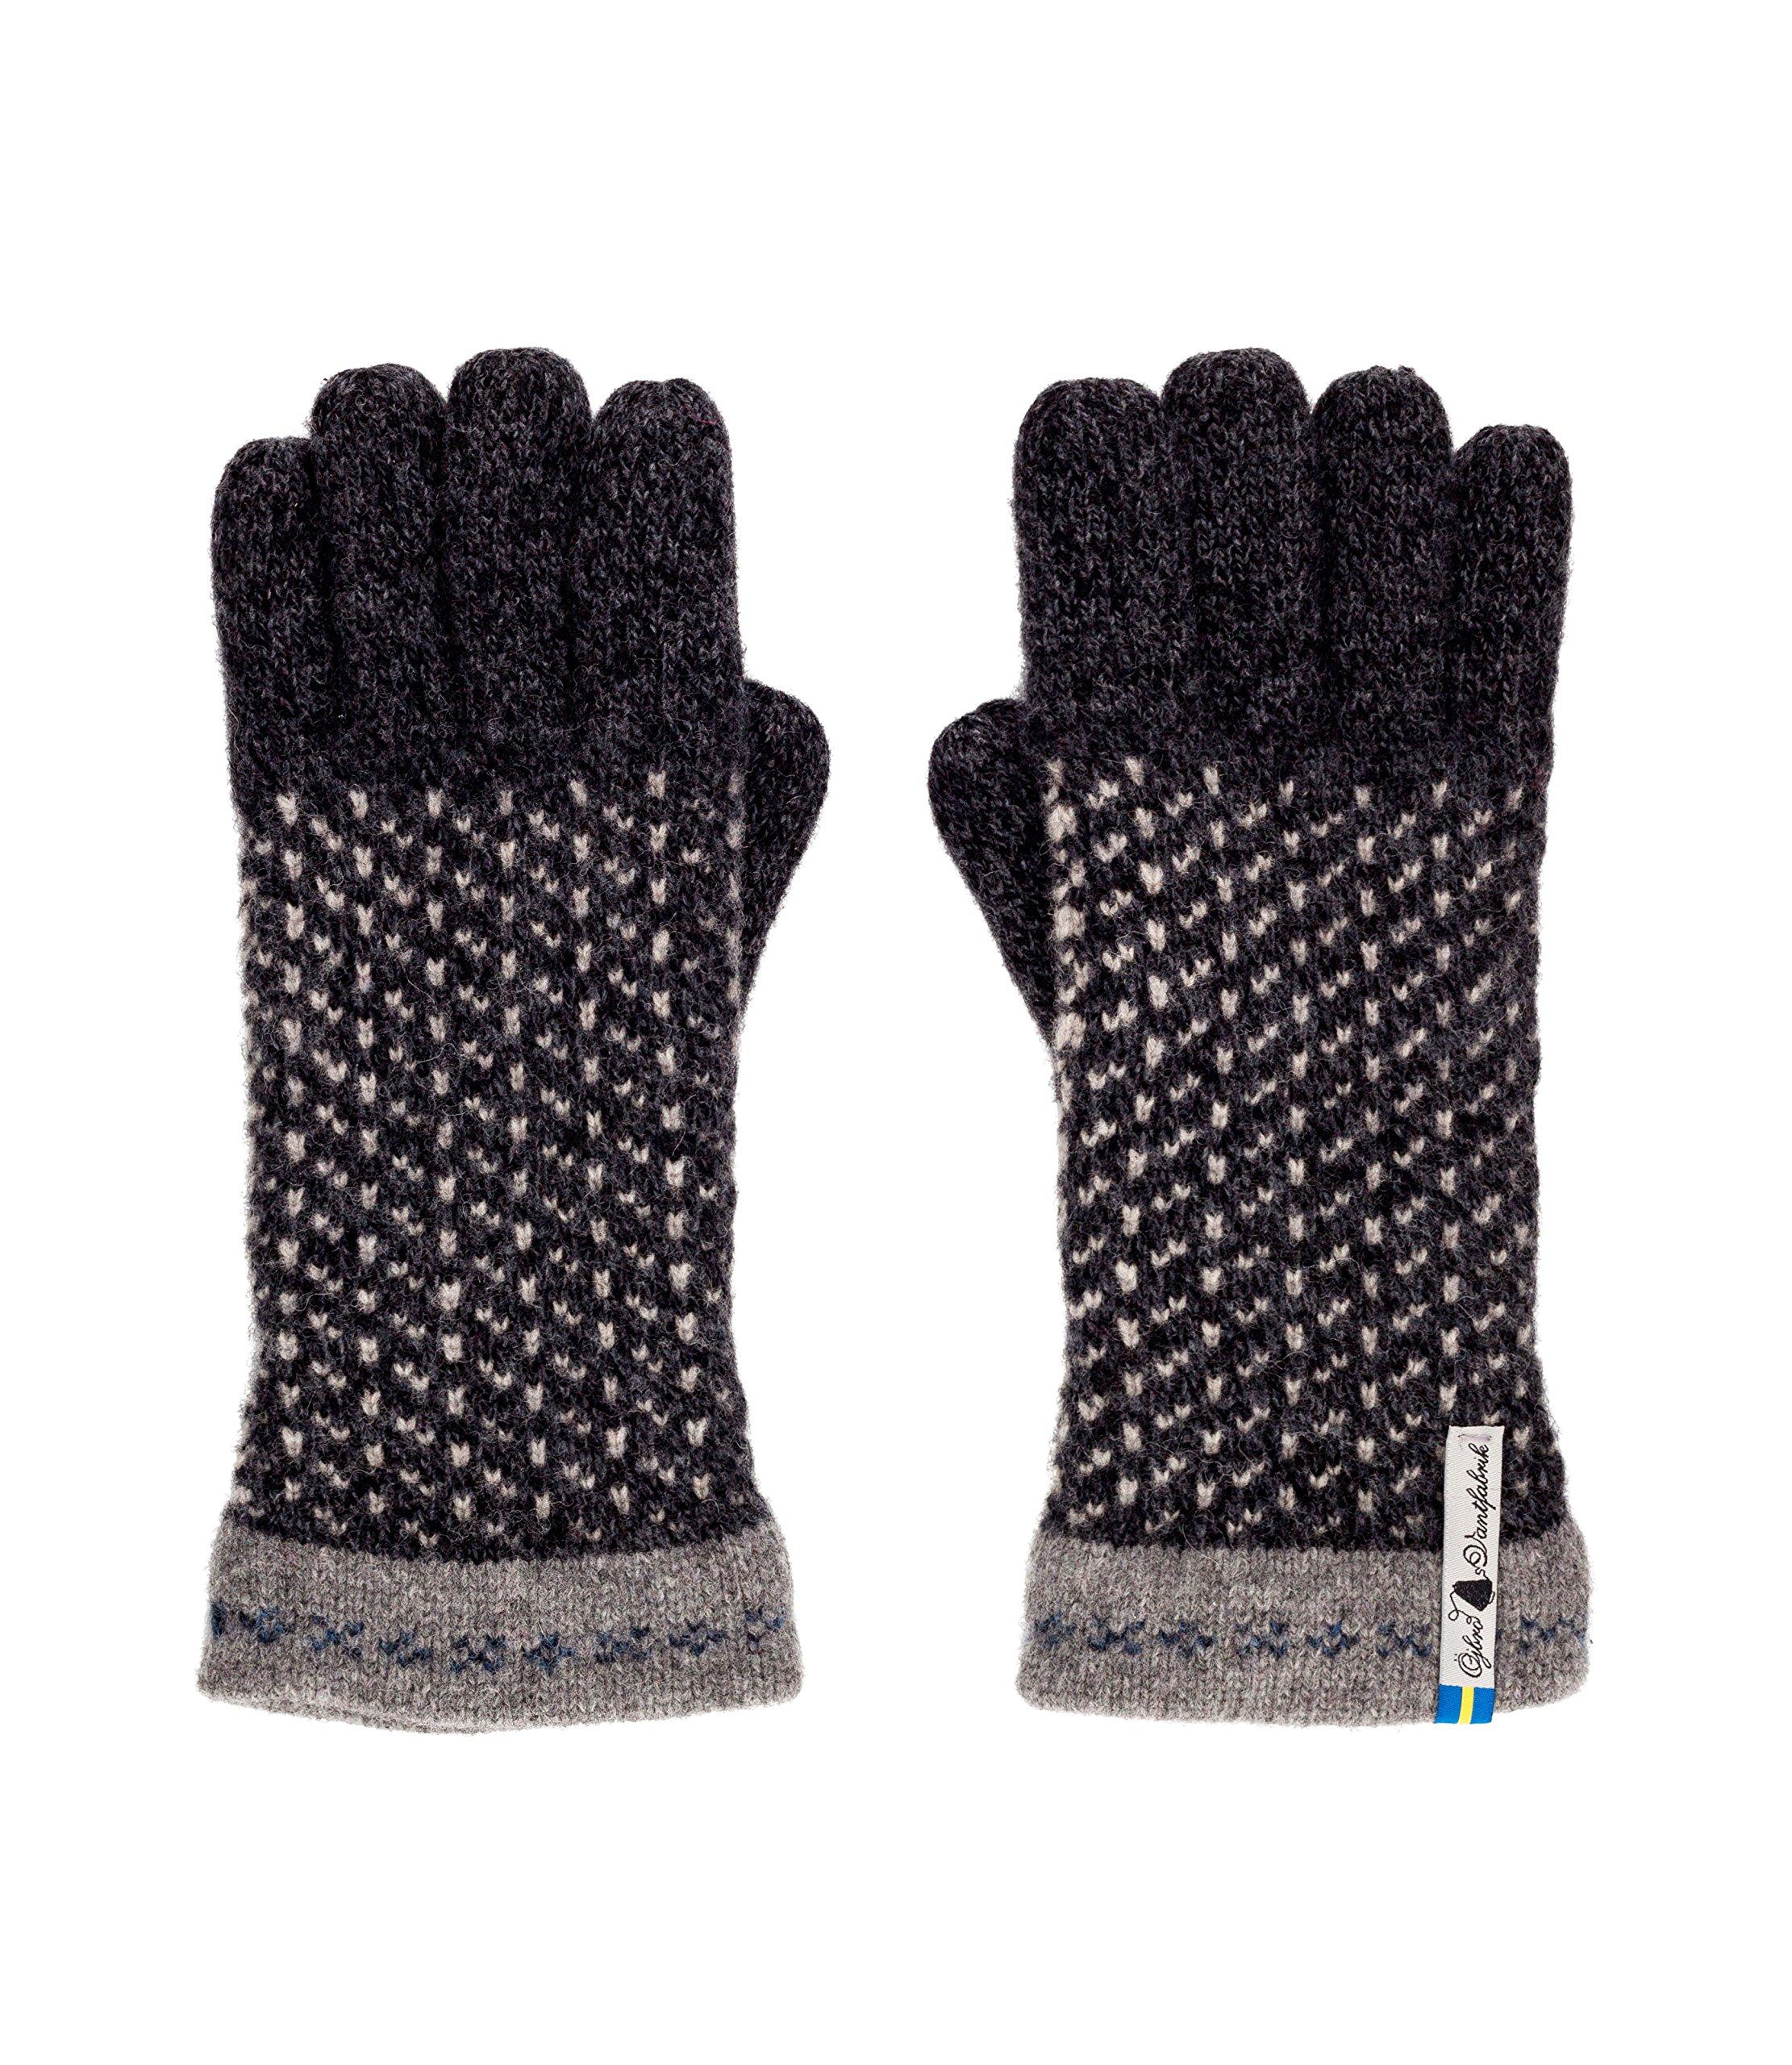 Öjbro Swedish made 100% Merino Wool Soft Thick & Extremely Warm Gloves (Large, Skaftö Sot)